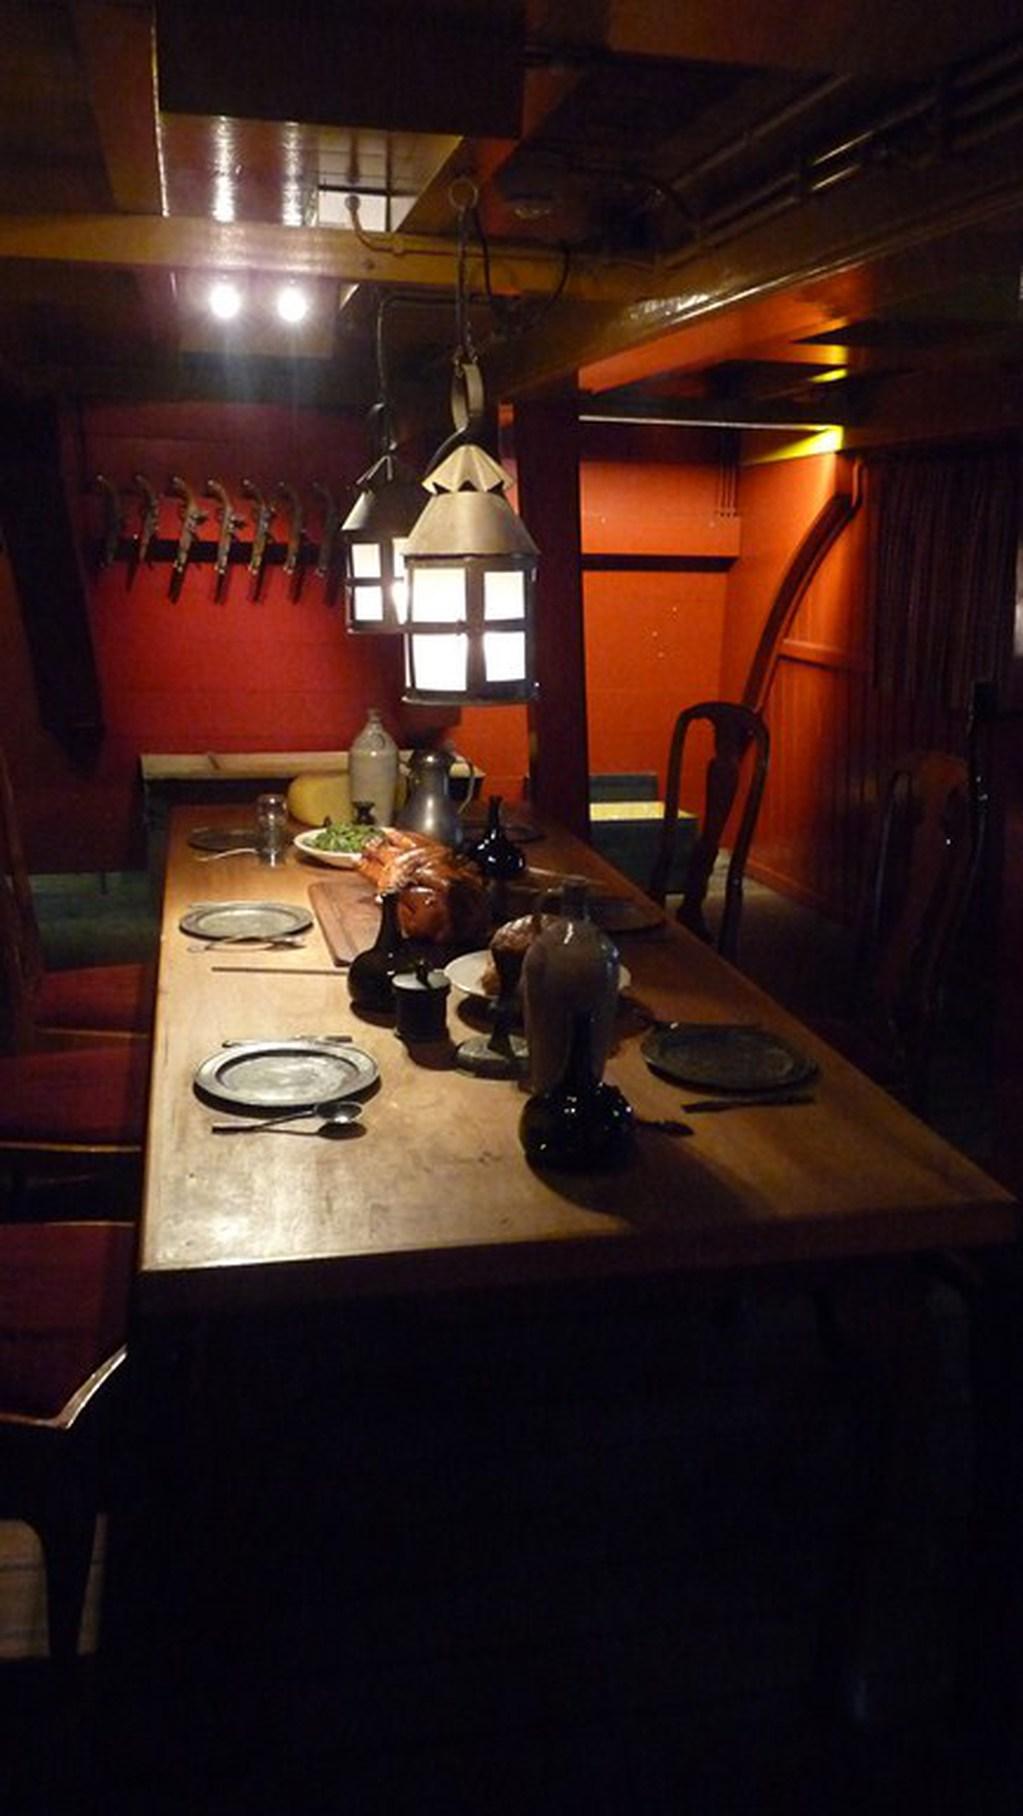 Visite du VOC « AMSTERDAM » (1749) à Amsterdam 17072807392523134915176604